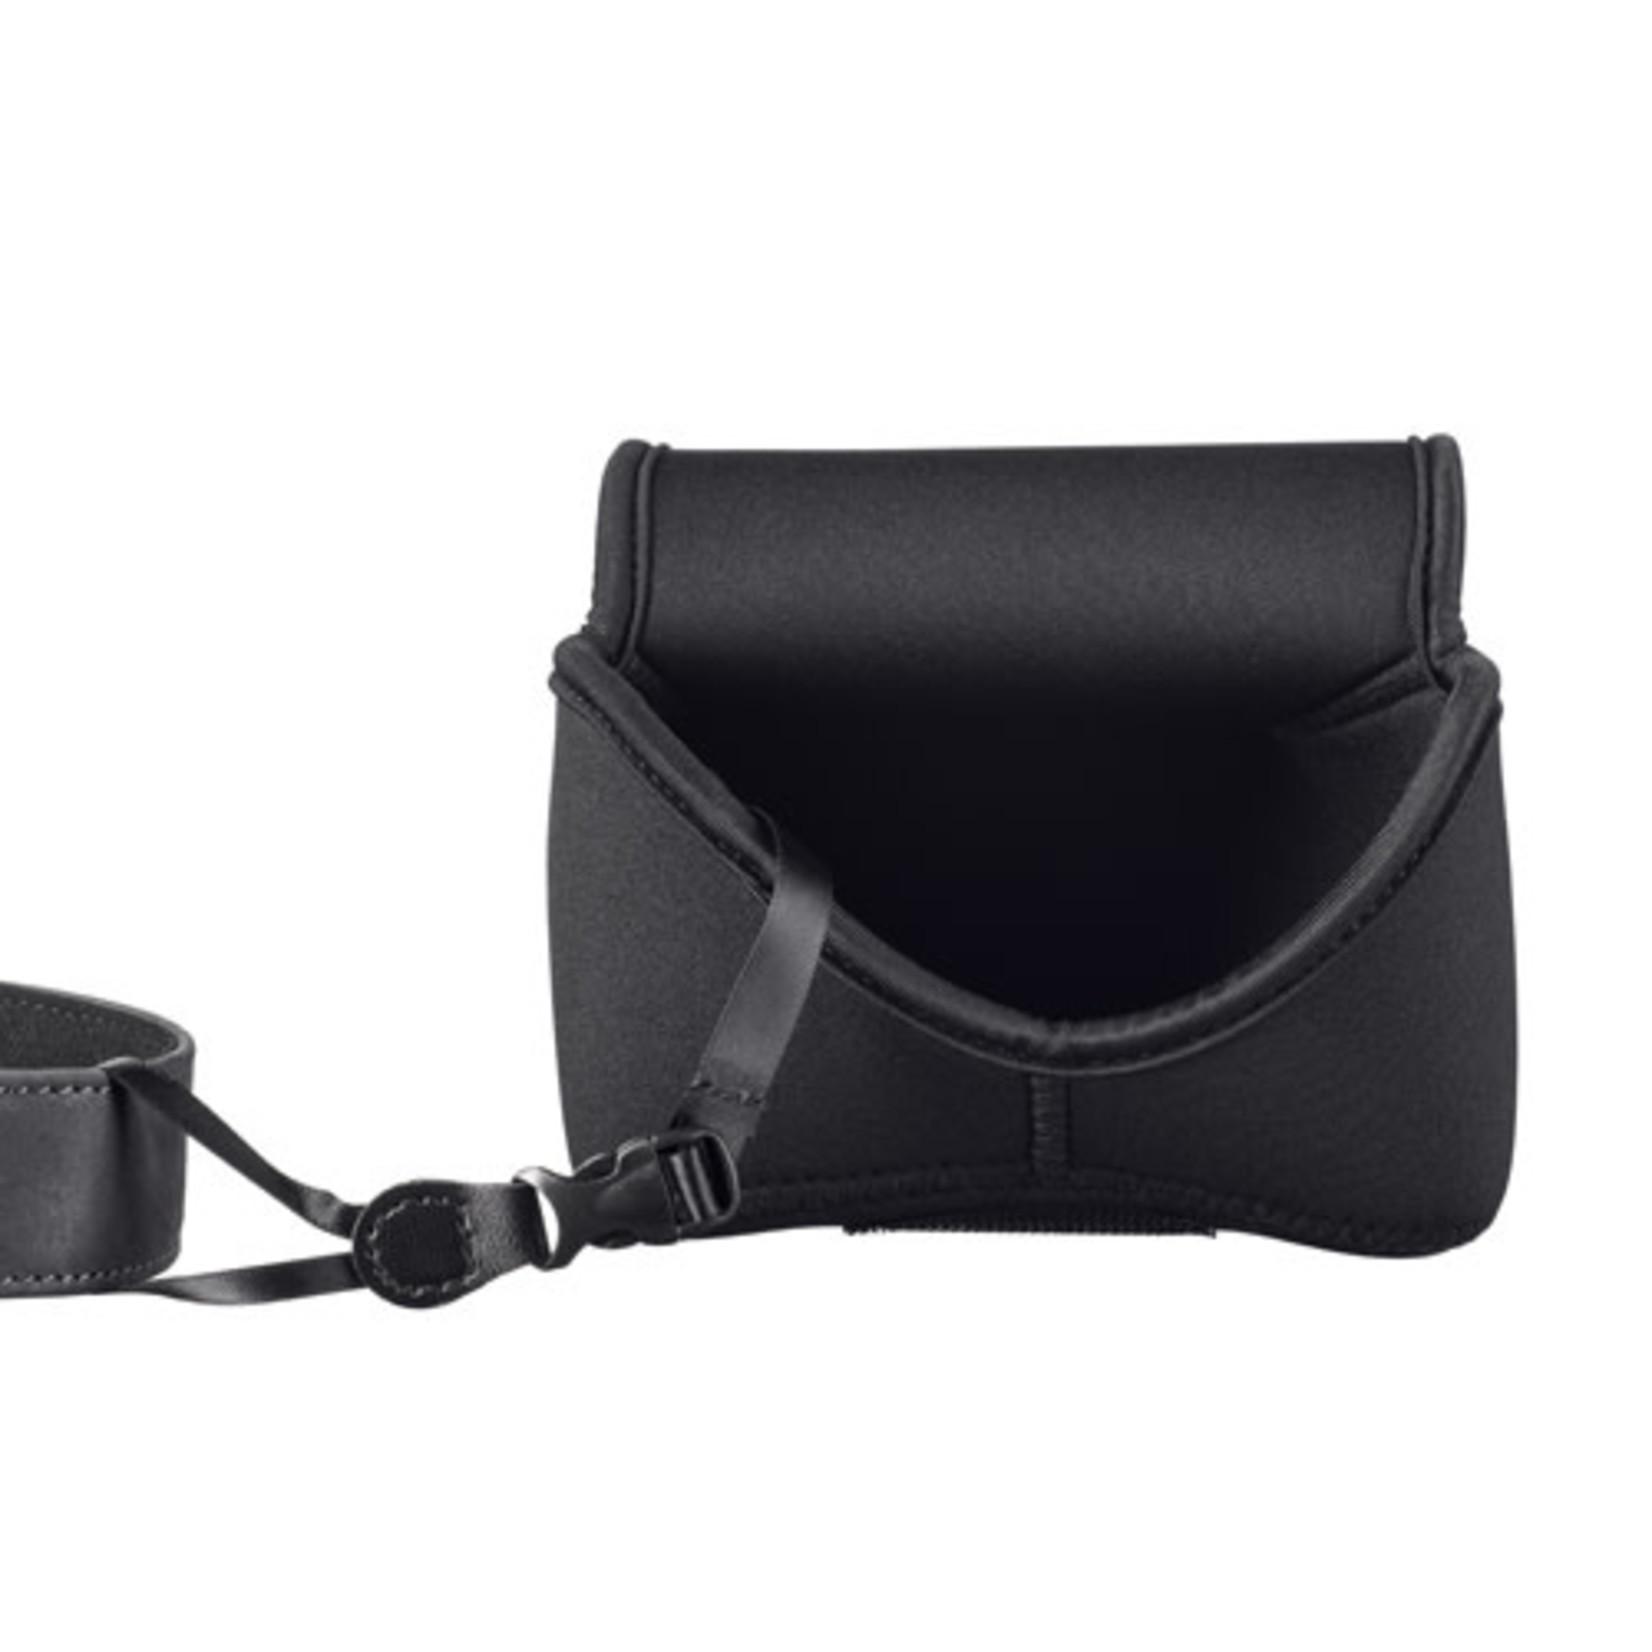 ProMaster Neoprene Mirrorless Camera Pouch - Large